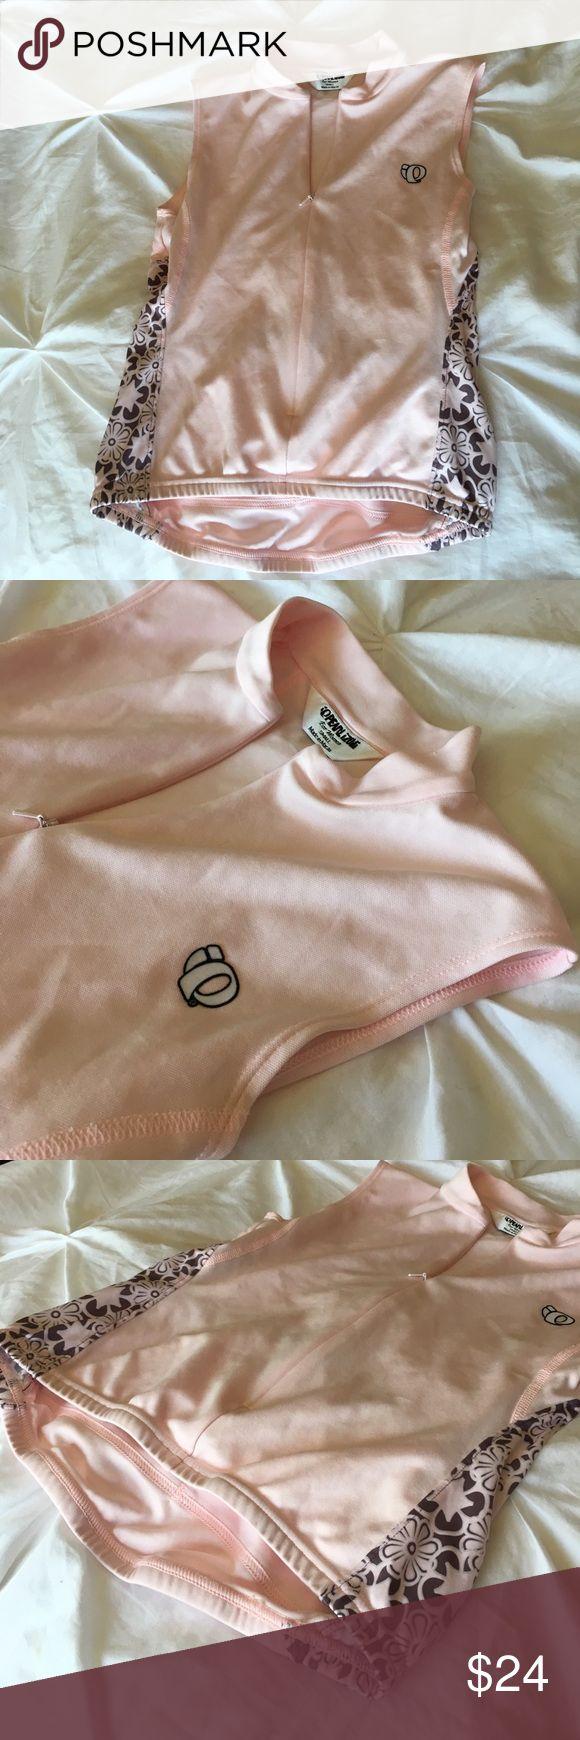 PearlIzumi sz S pink cycling top. Two back pockets Pearl Izumi, size Small pink sleeveless cycling top. Two back pockets. Elastic waist to keep in place. Smoke free home. Pearl Izumi Tops